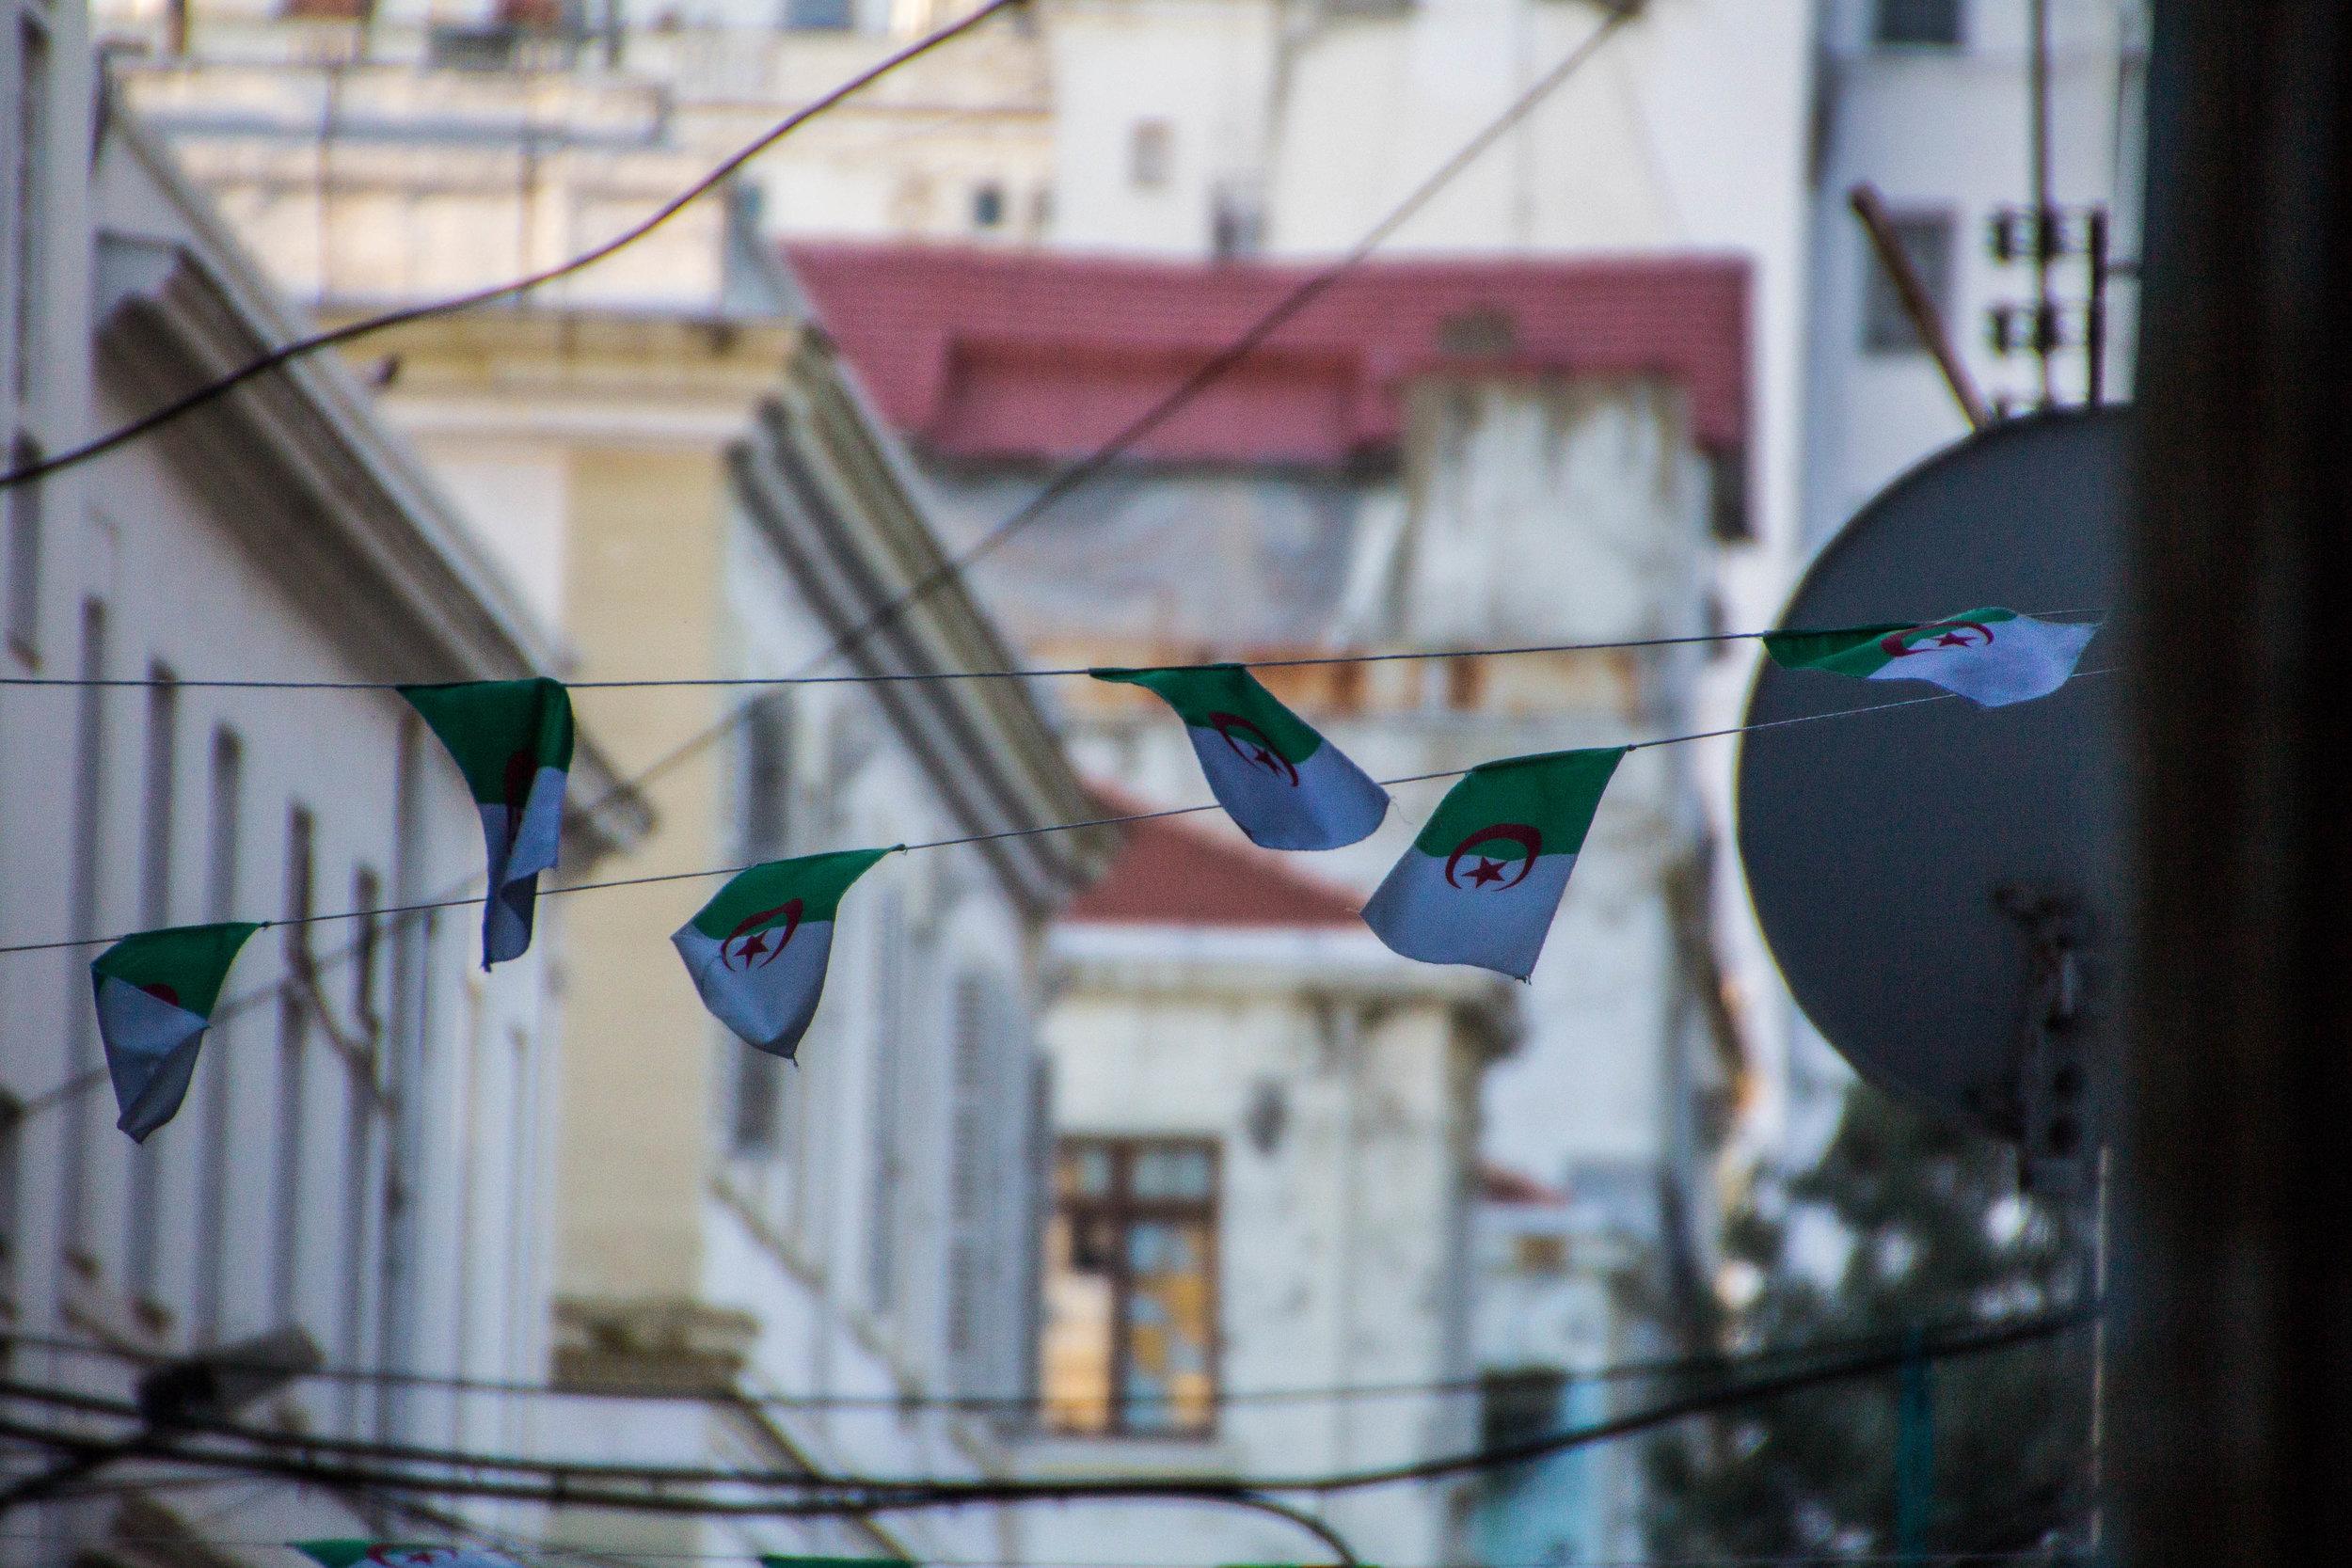 streets-algiers-algeria-21-2.jpg